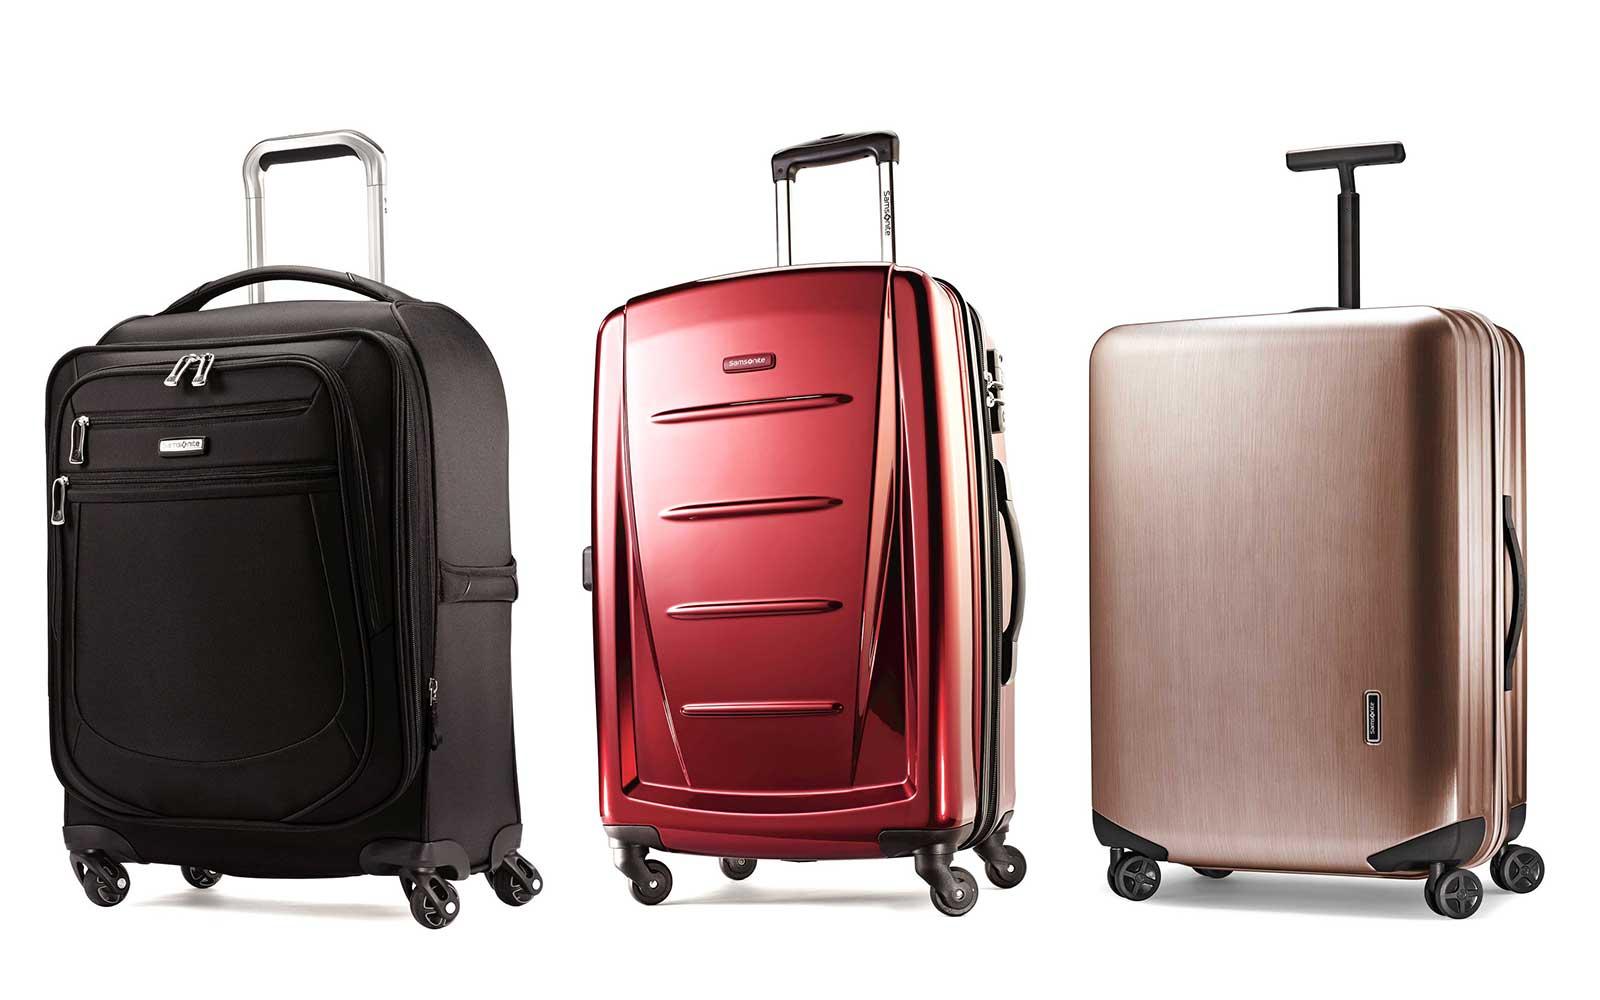 Samsonite Luggage and Suitcases